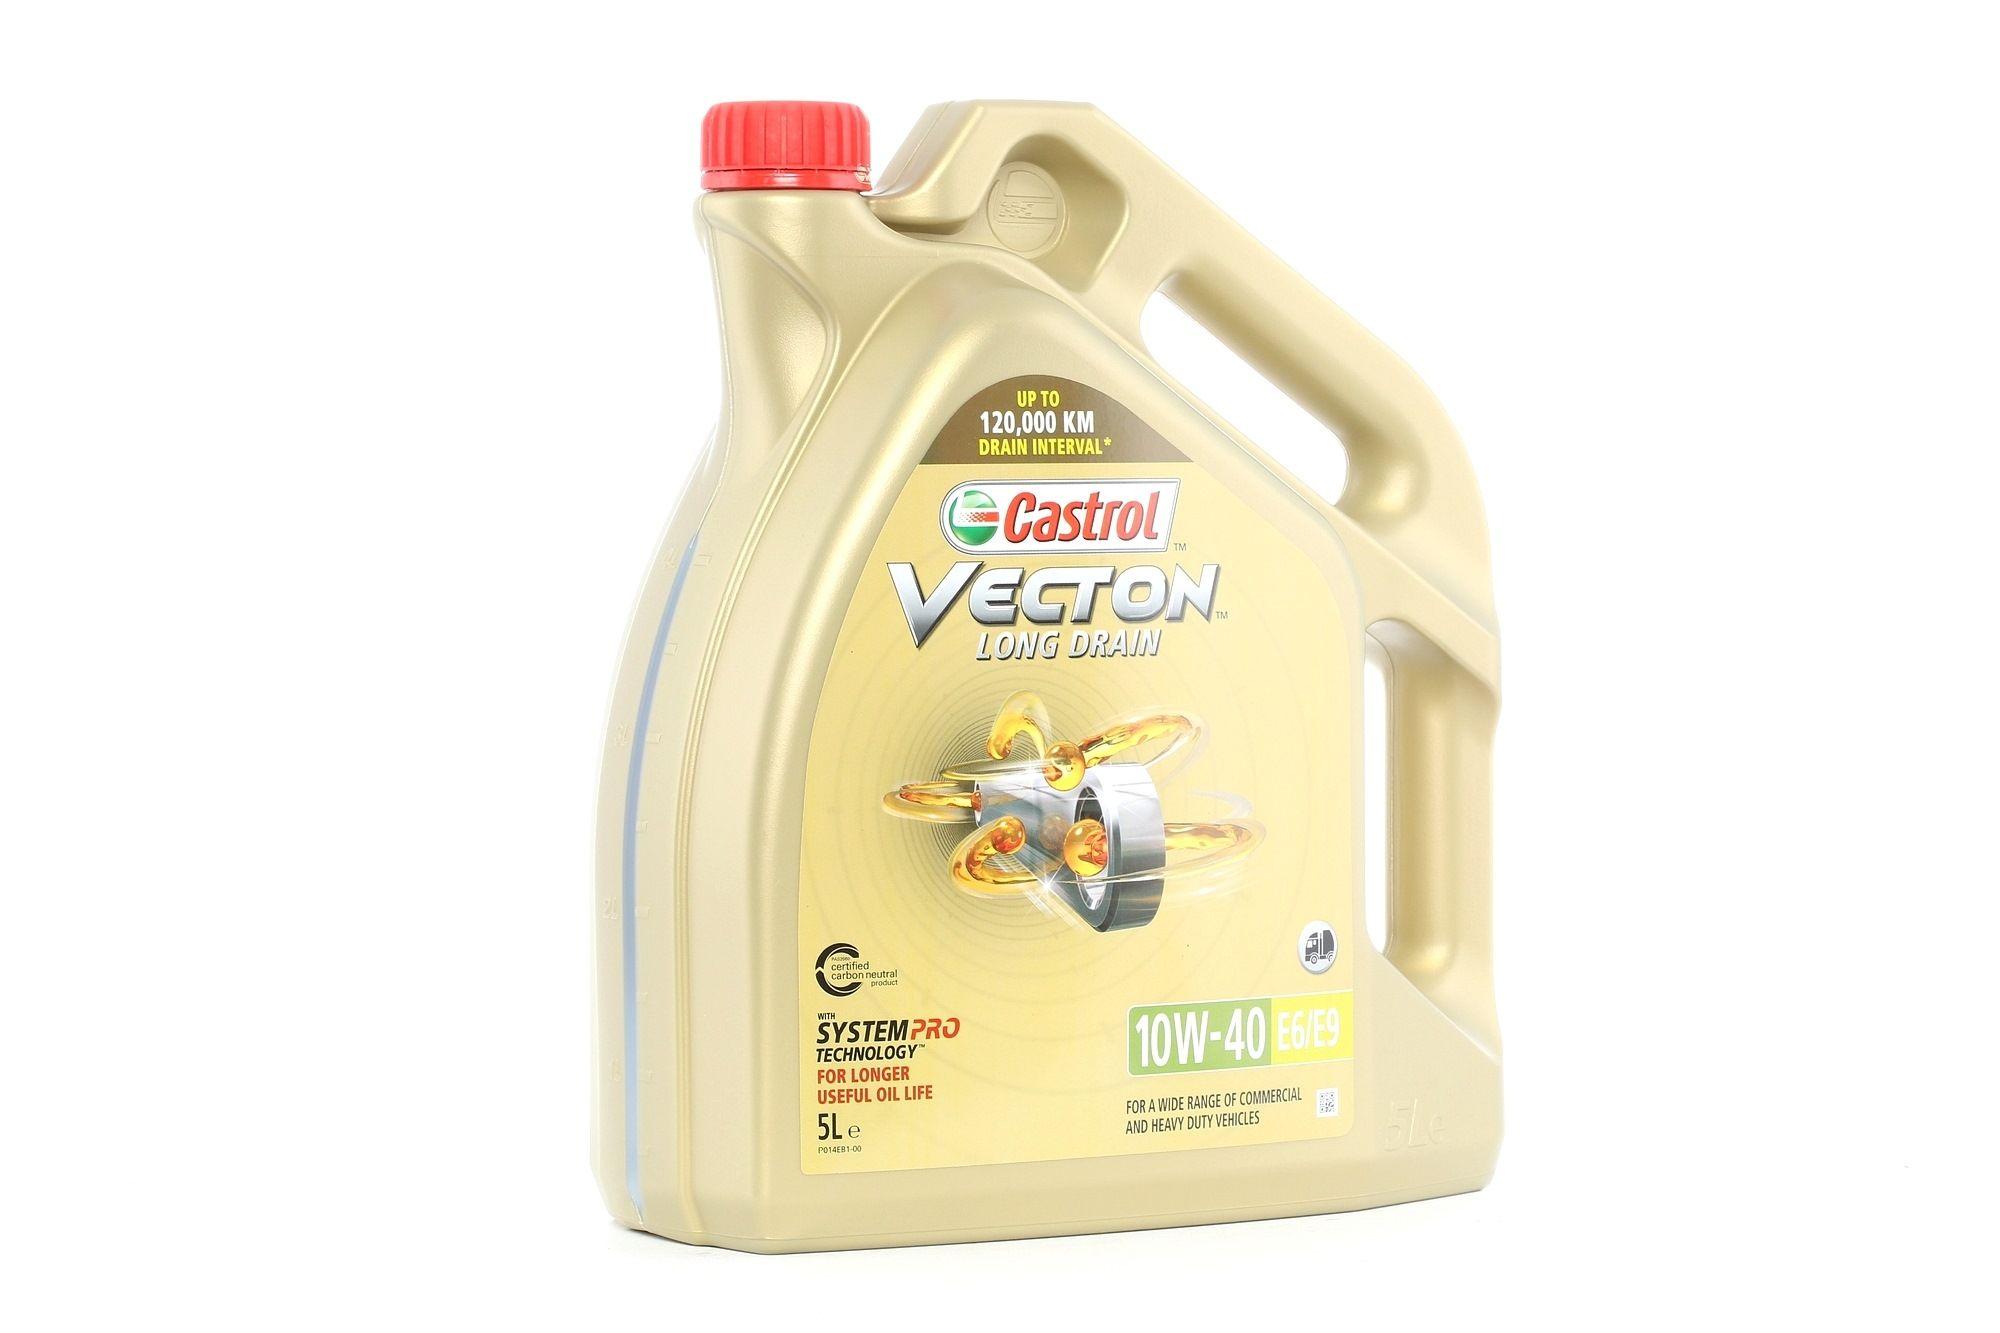 CASTROL Motoröl 154AC9 günstig mit 20% Rabatt